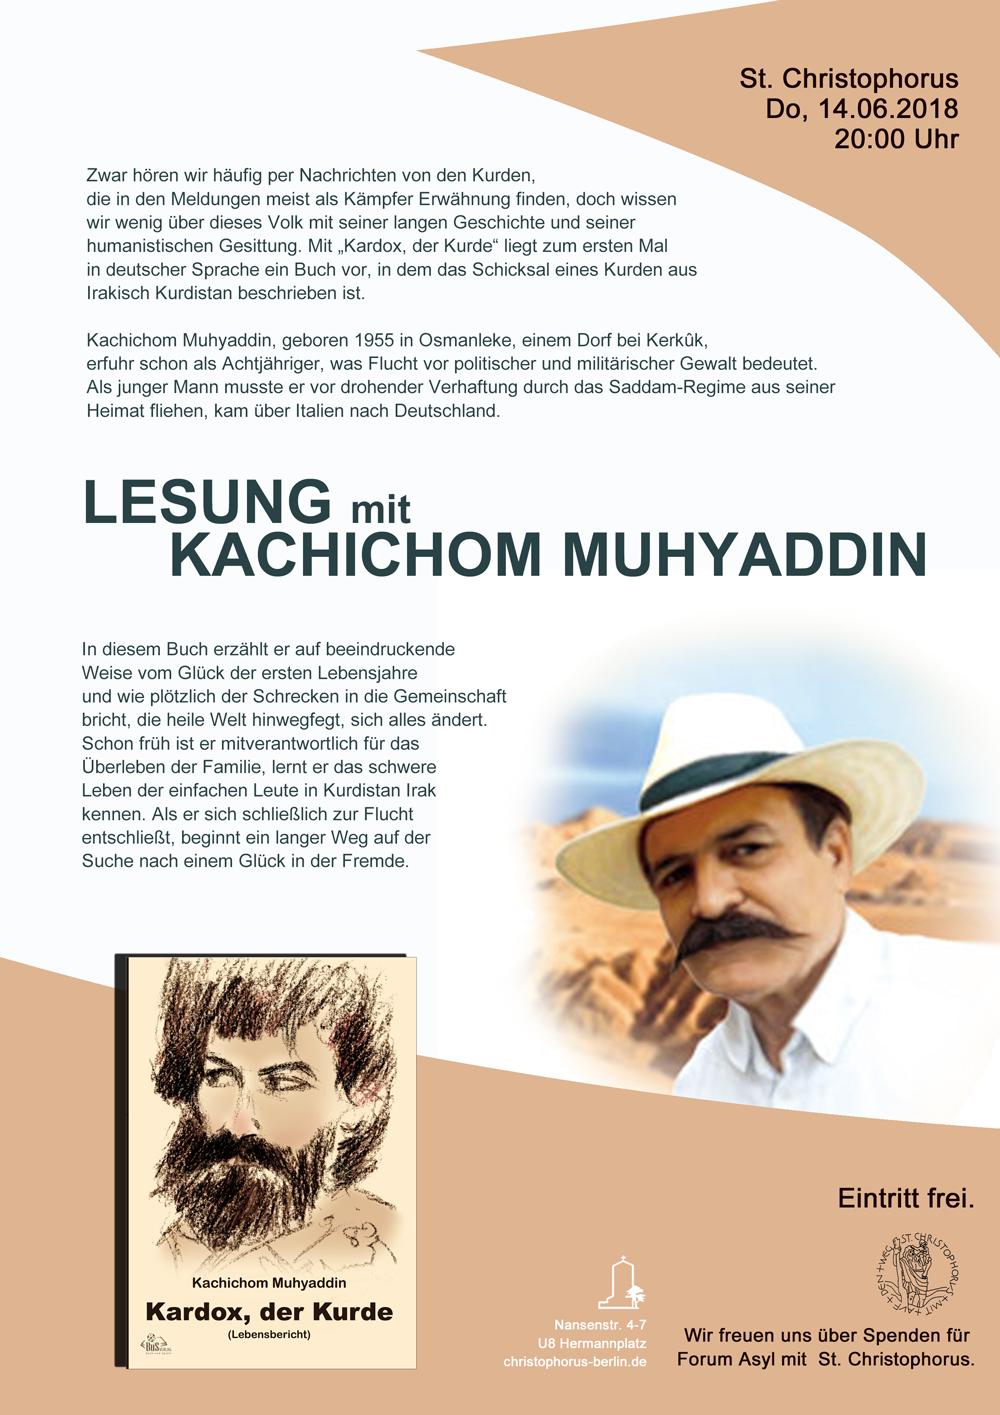 Lesung mit Kachichom Muhyaddin